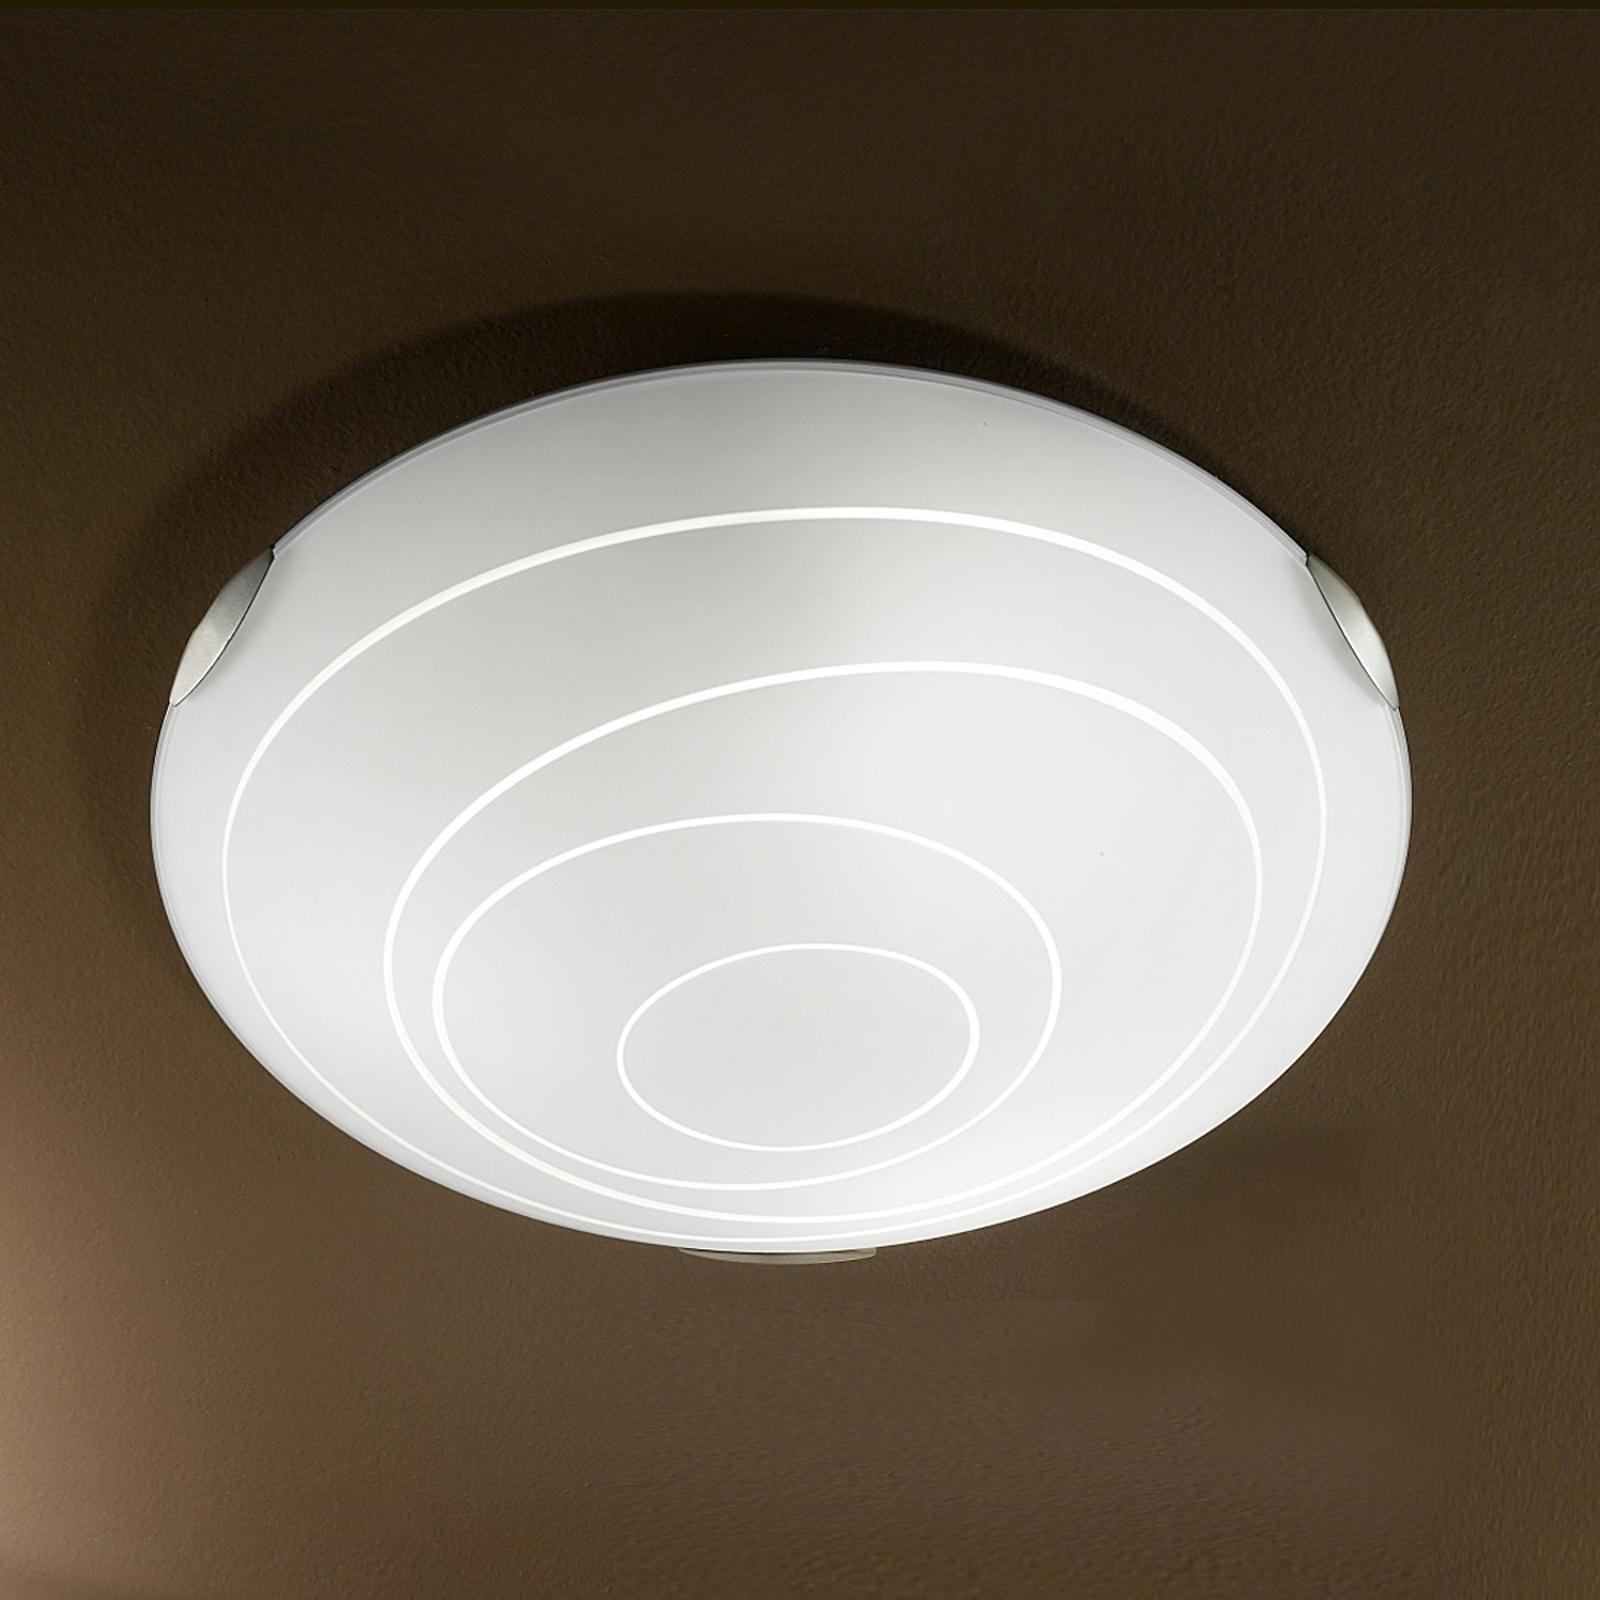 Okrúhle stropné svietidlo KENT, biele_3502199_1